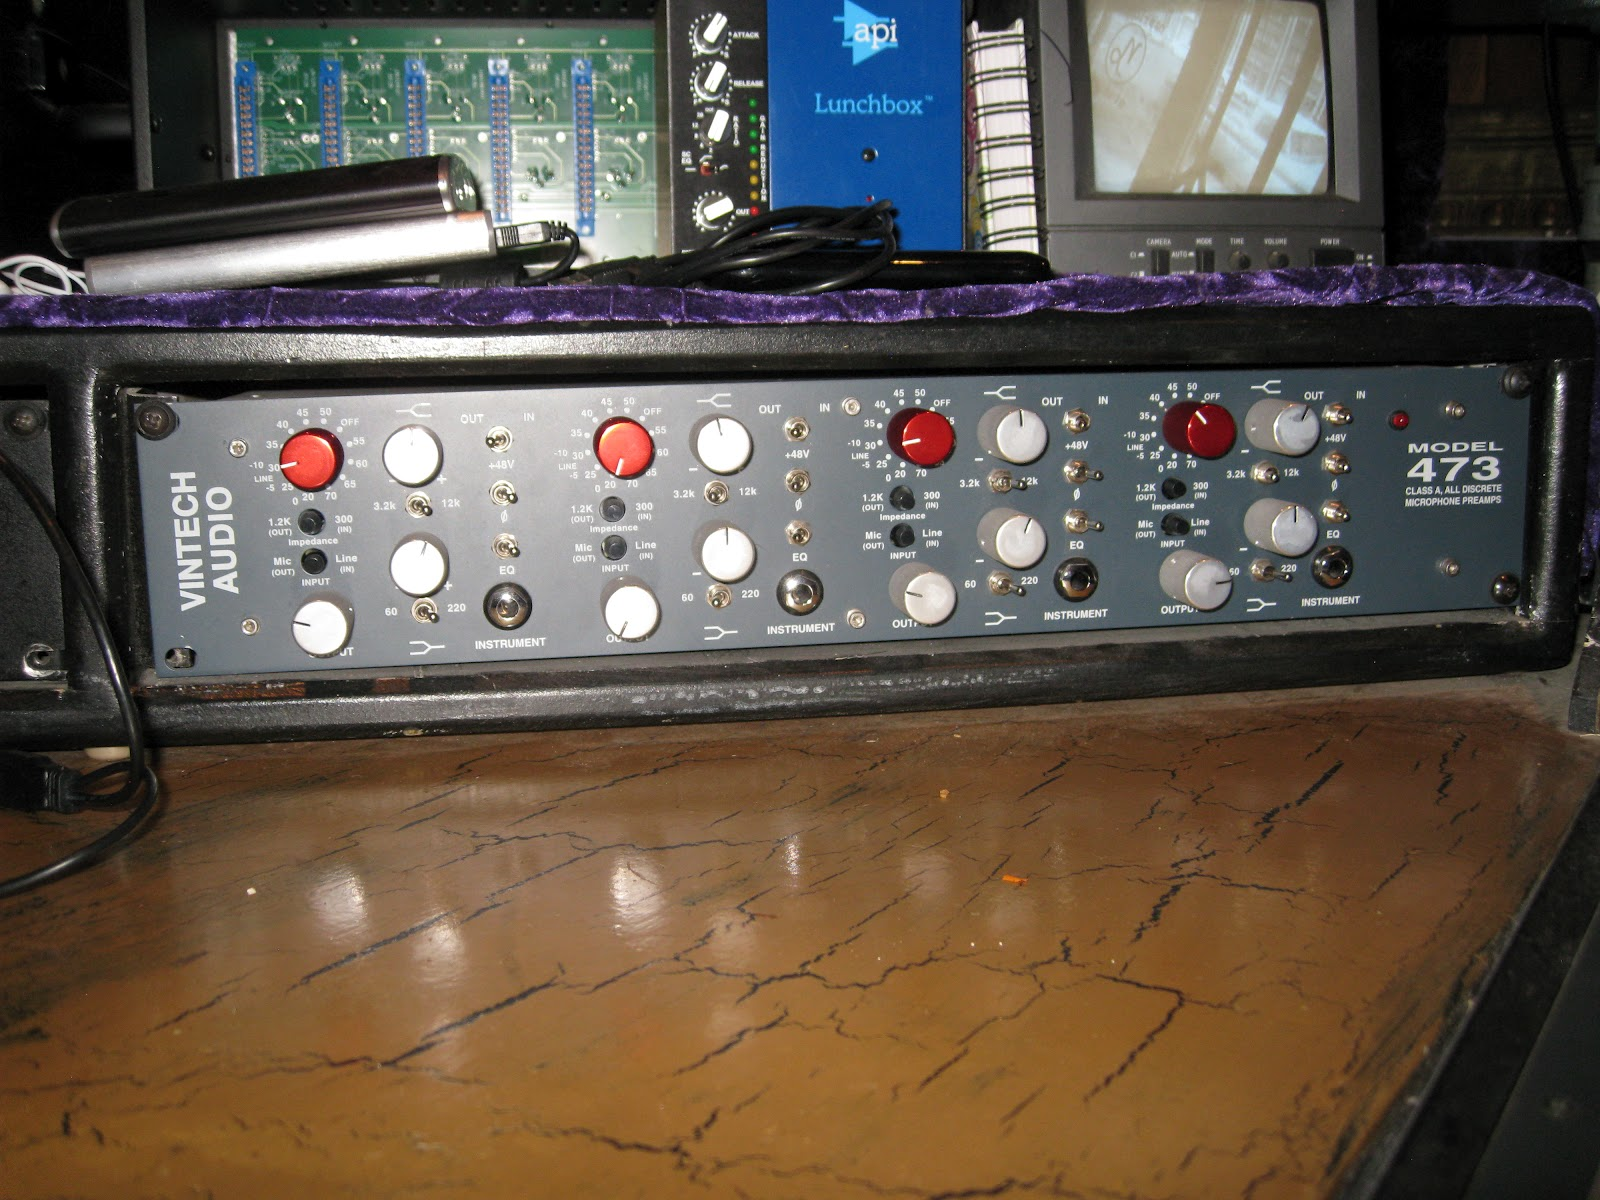 vintech vintech 473 mic preamp preamp microphone preamp an equalizer  [ 1600 x 1200 Pixel ]